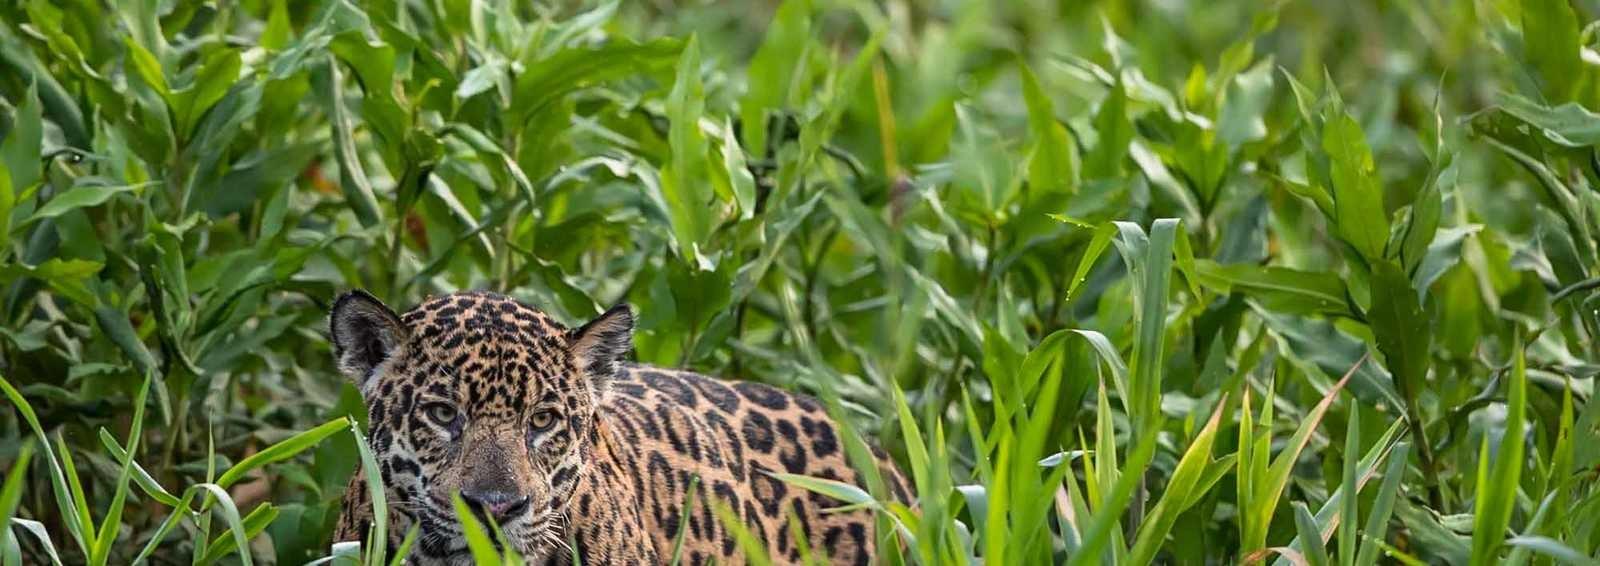 Jaguar in the Pantanal, Brazil (Image by Paul Goldstein)